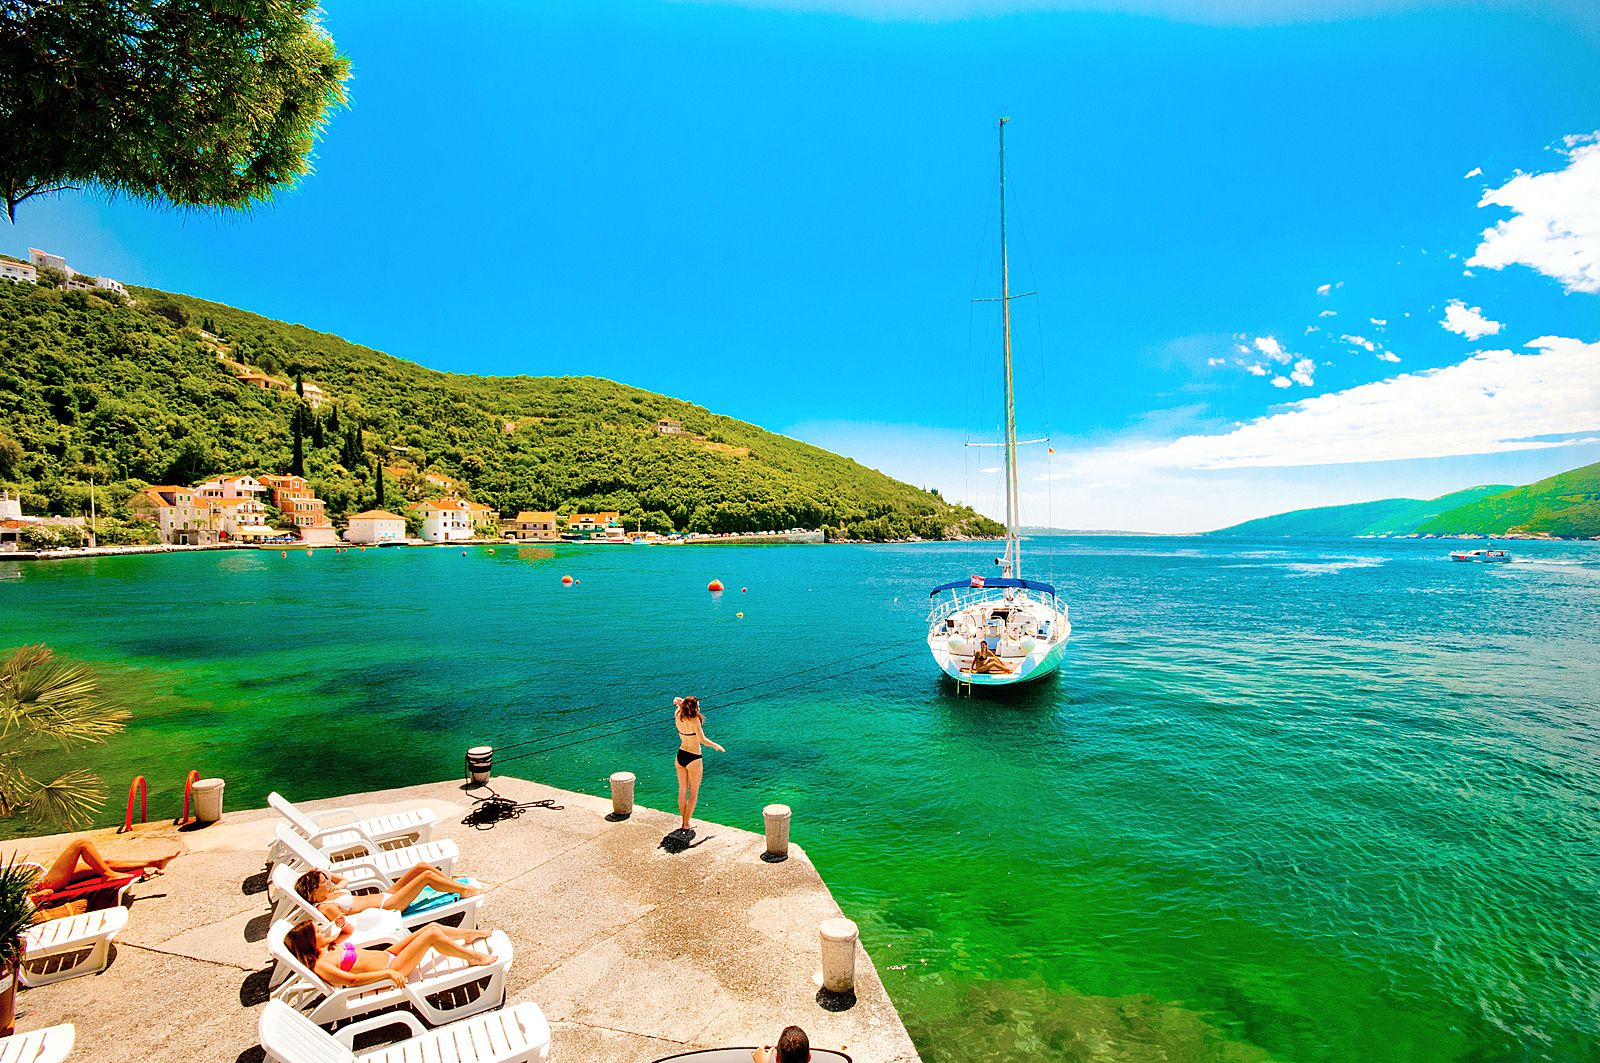 vacances au montenegro Forte Rose Kotor Bay in Montenegro Forte Rosedans les Bouches de kotor au  Monténégro Vacances Montenegro